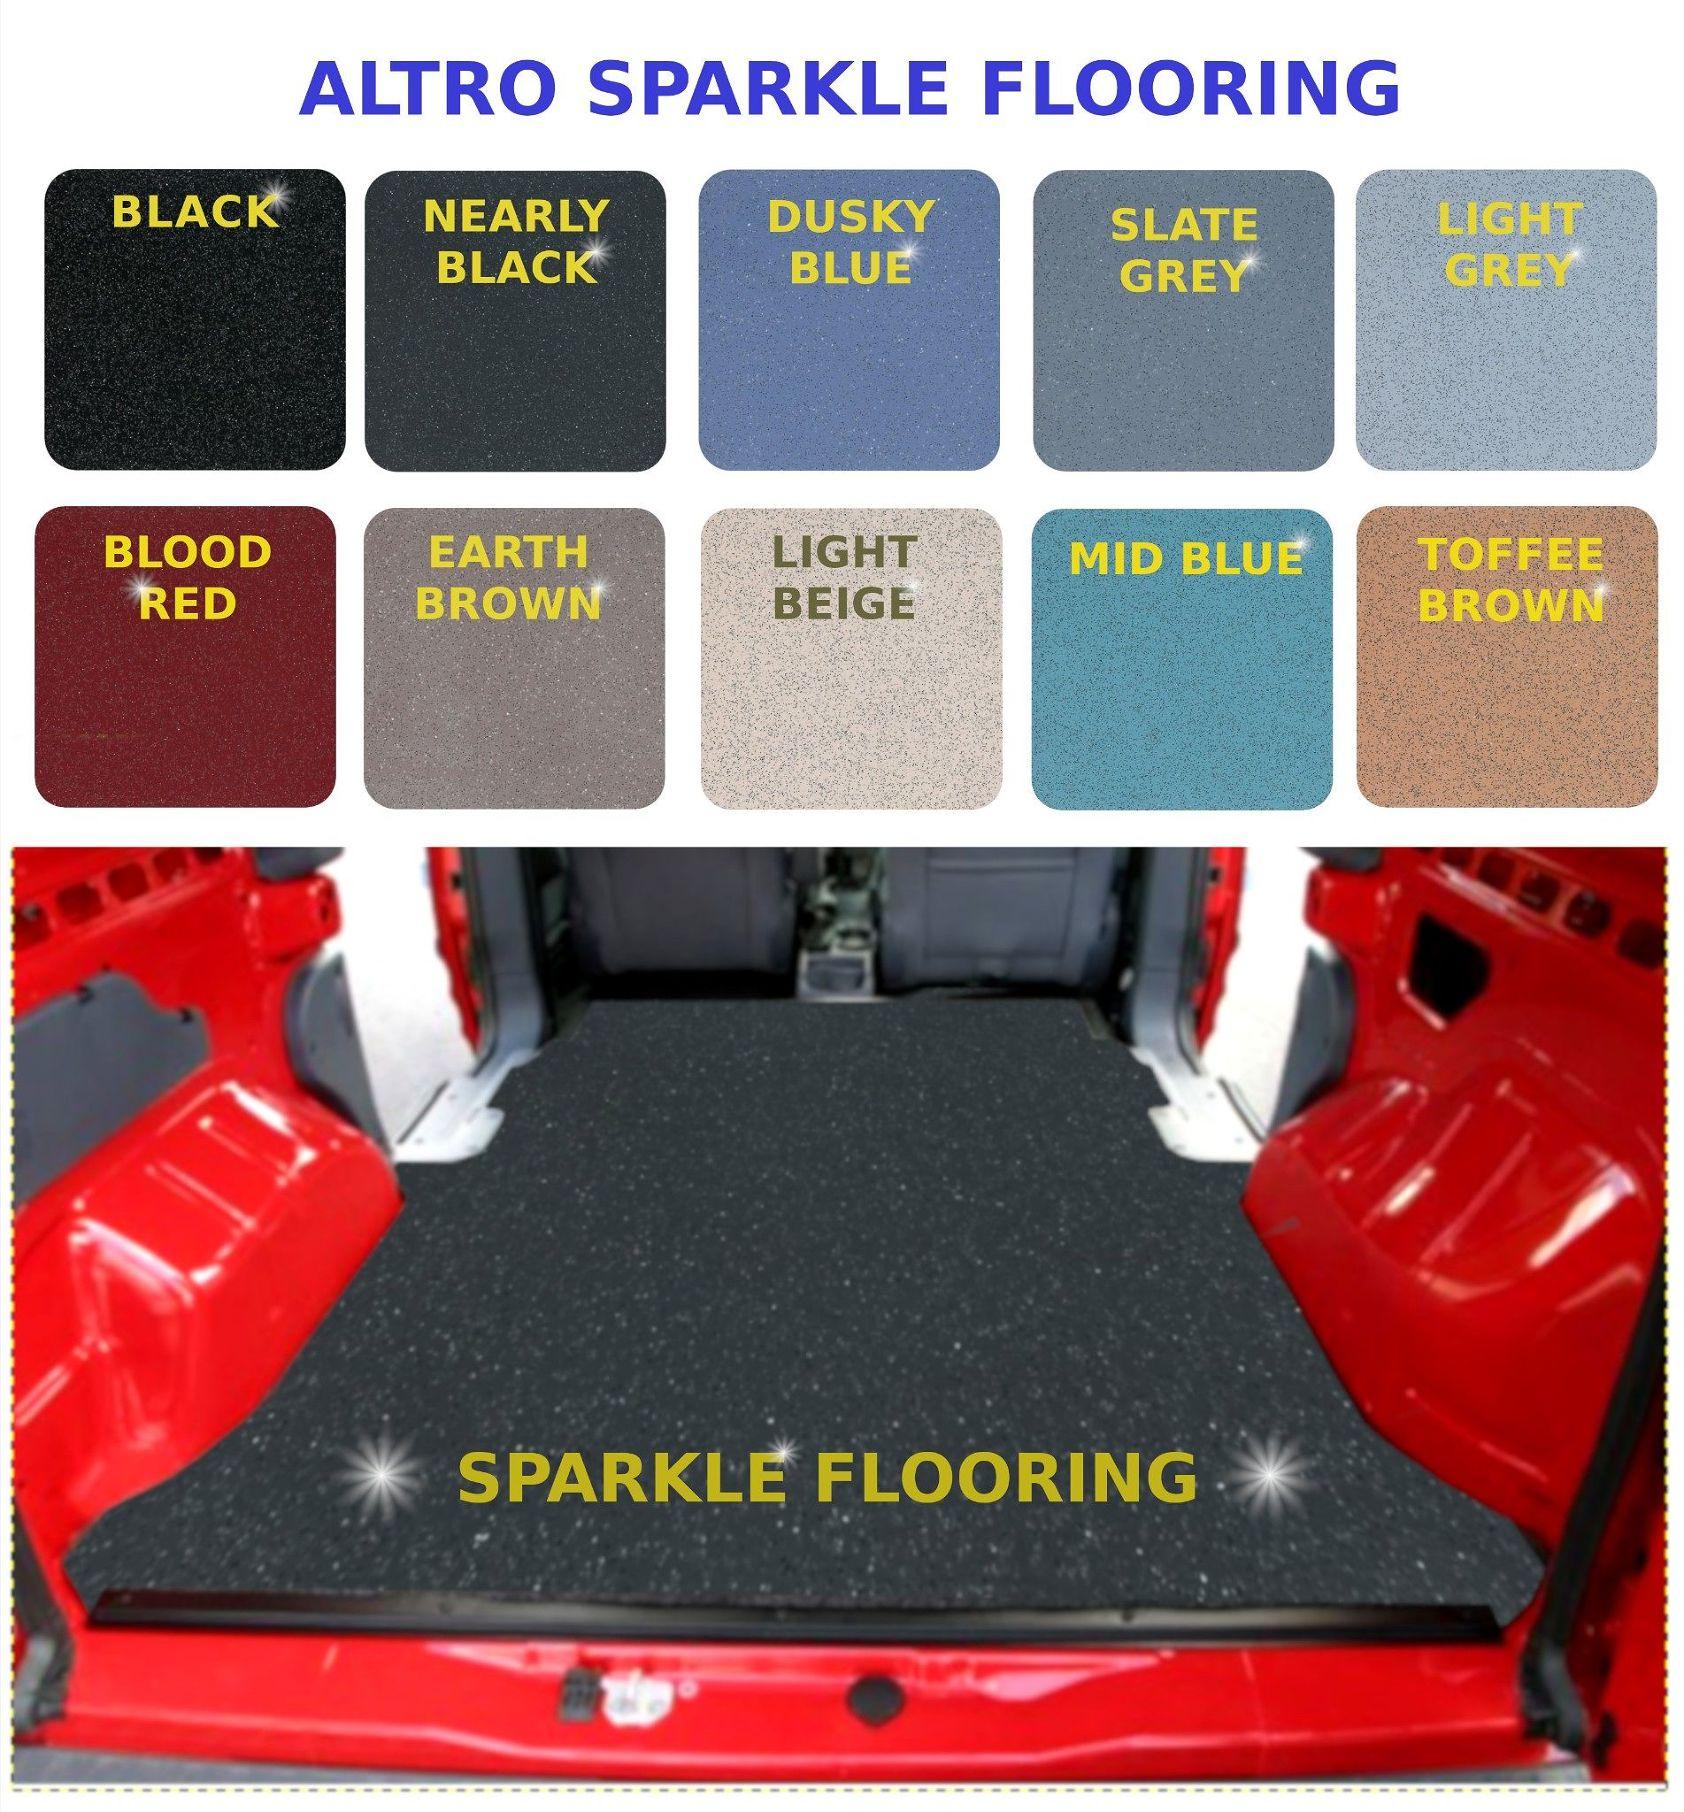 Altro contrax van vinyl flooring